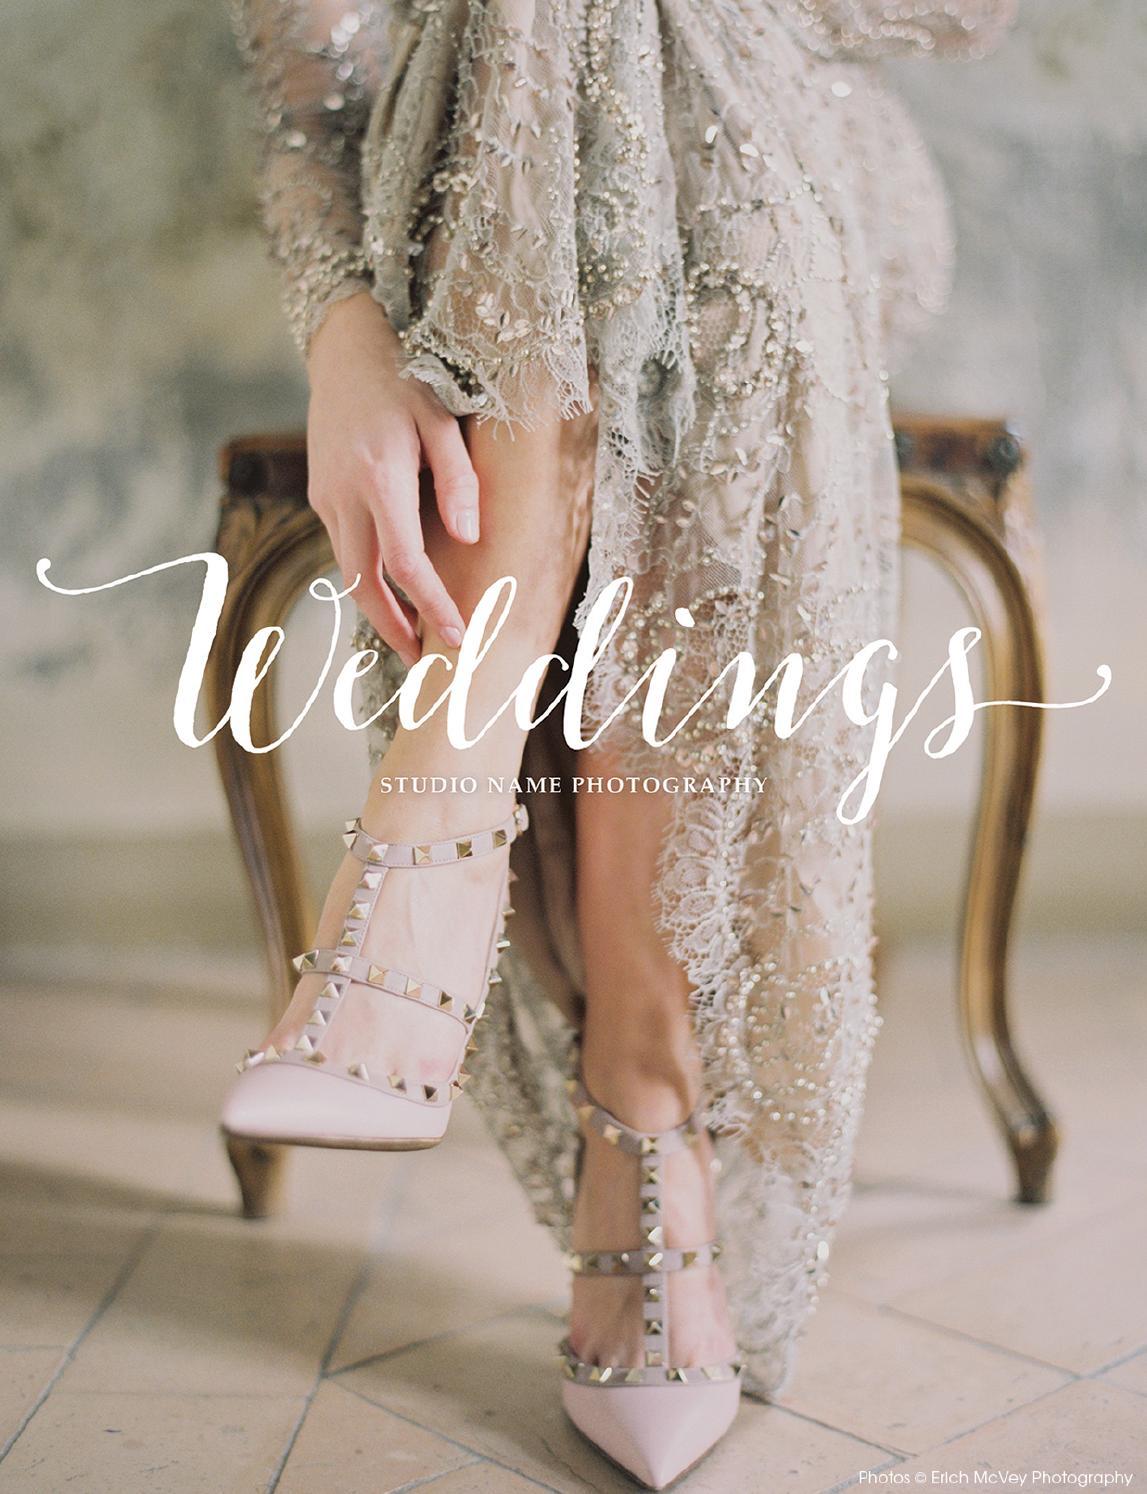 Wedding Photography Brochure Template | \